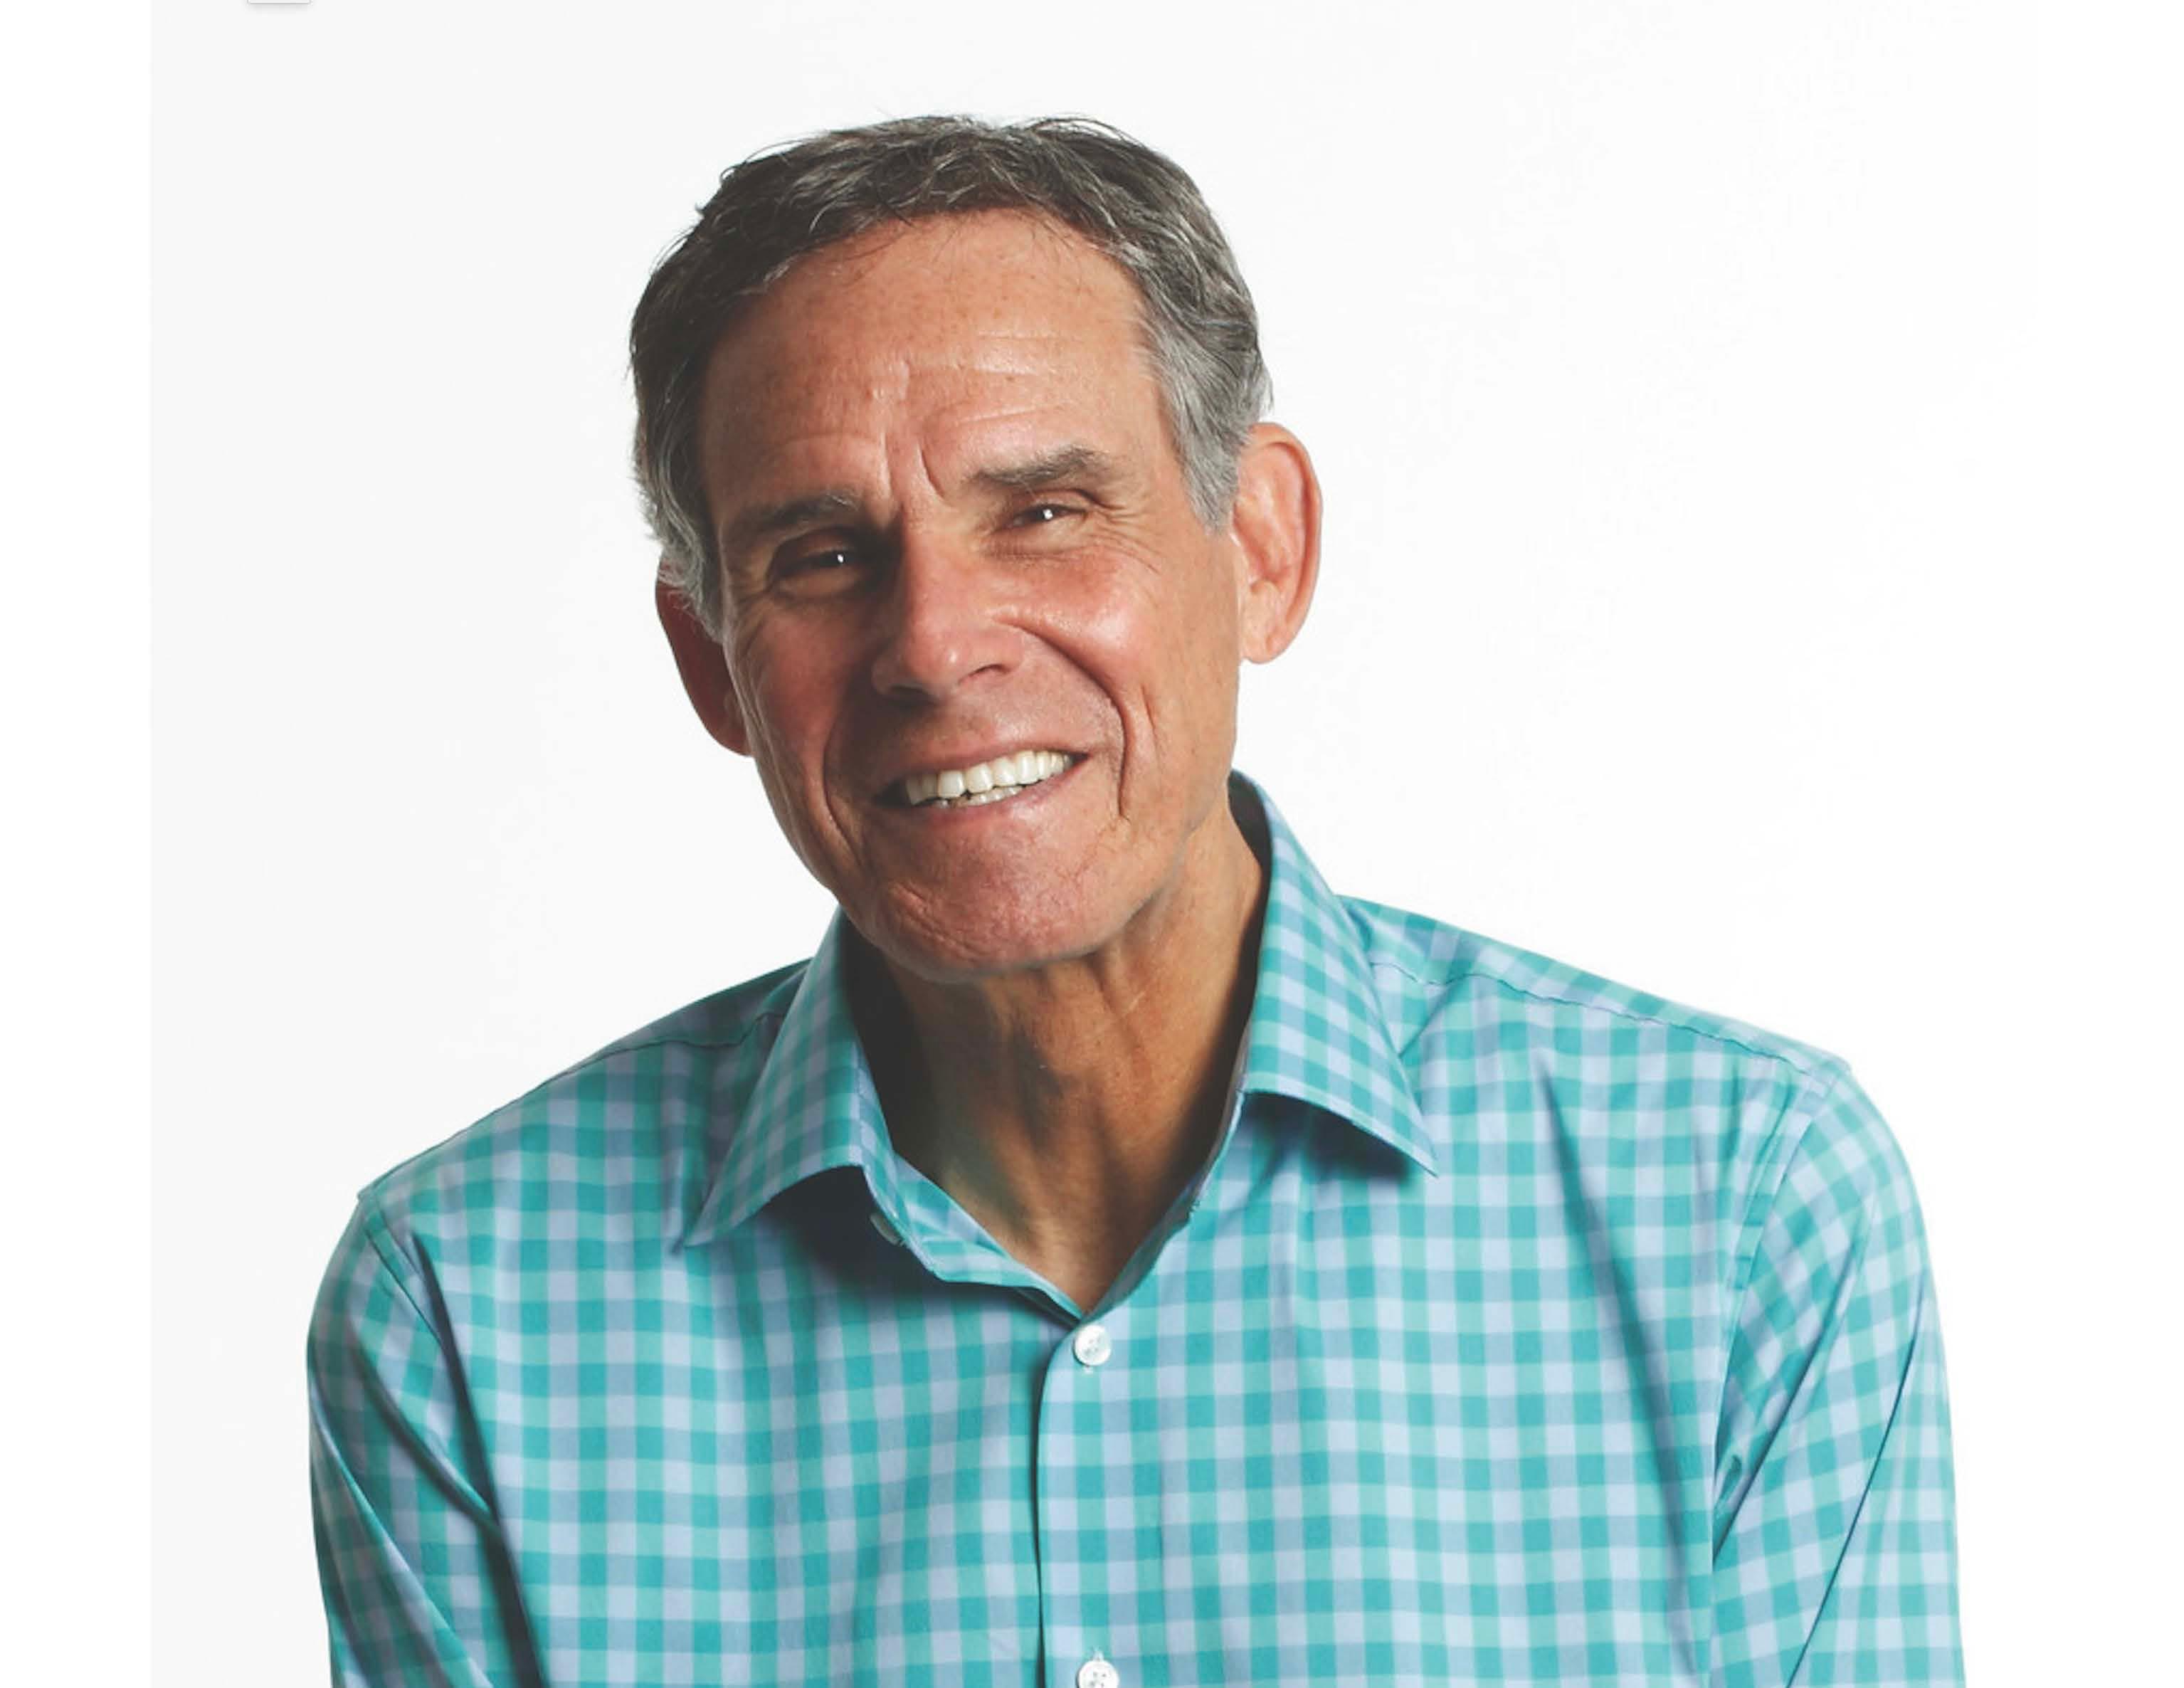 Eric Topol, MD, author of Deep Medicine